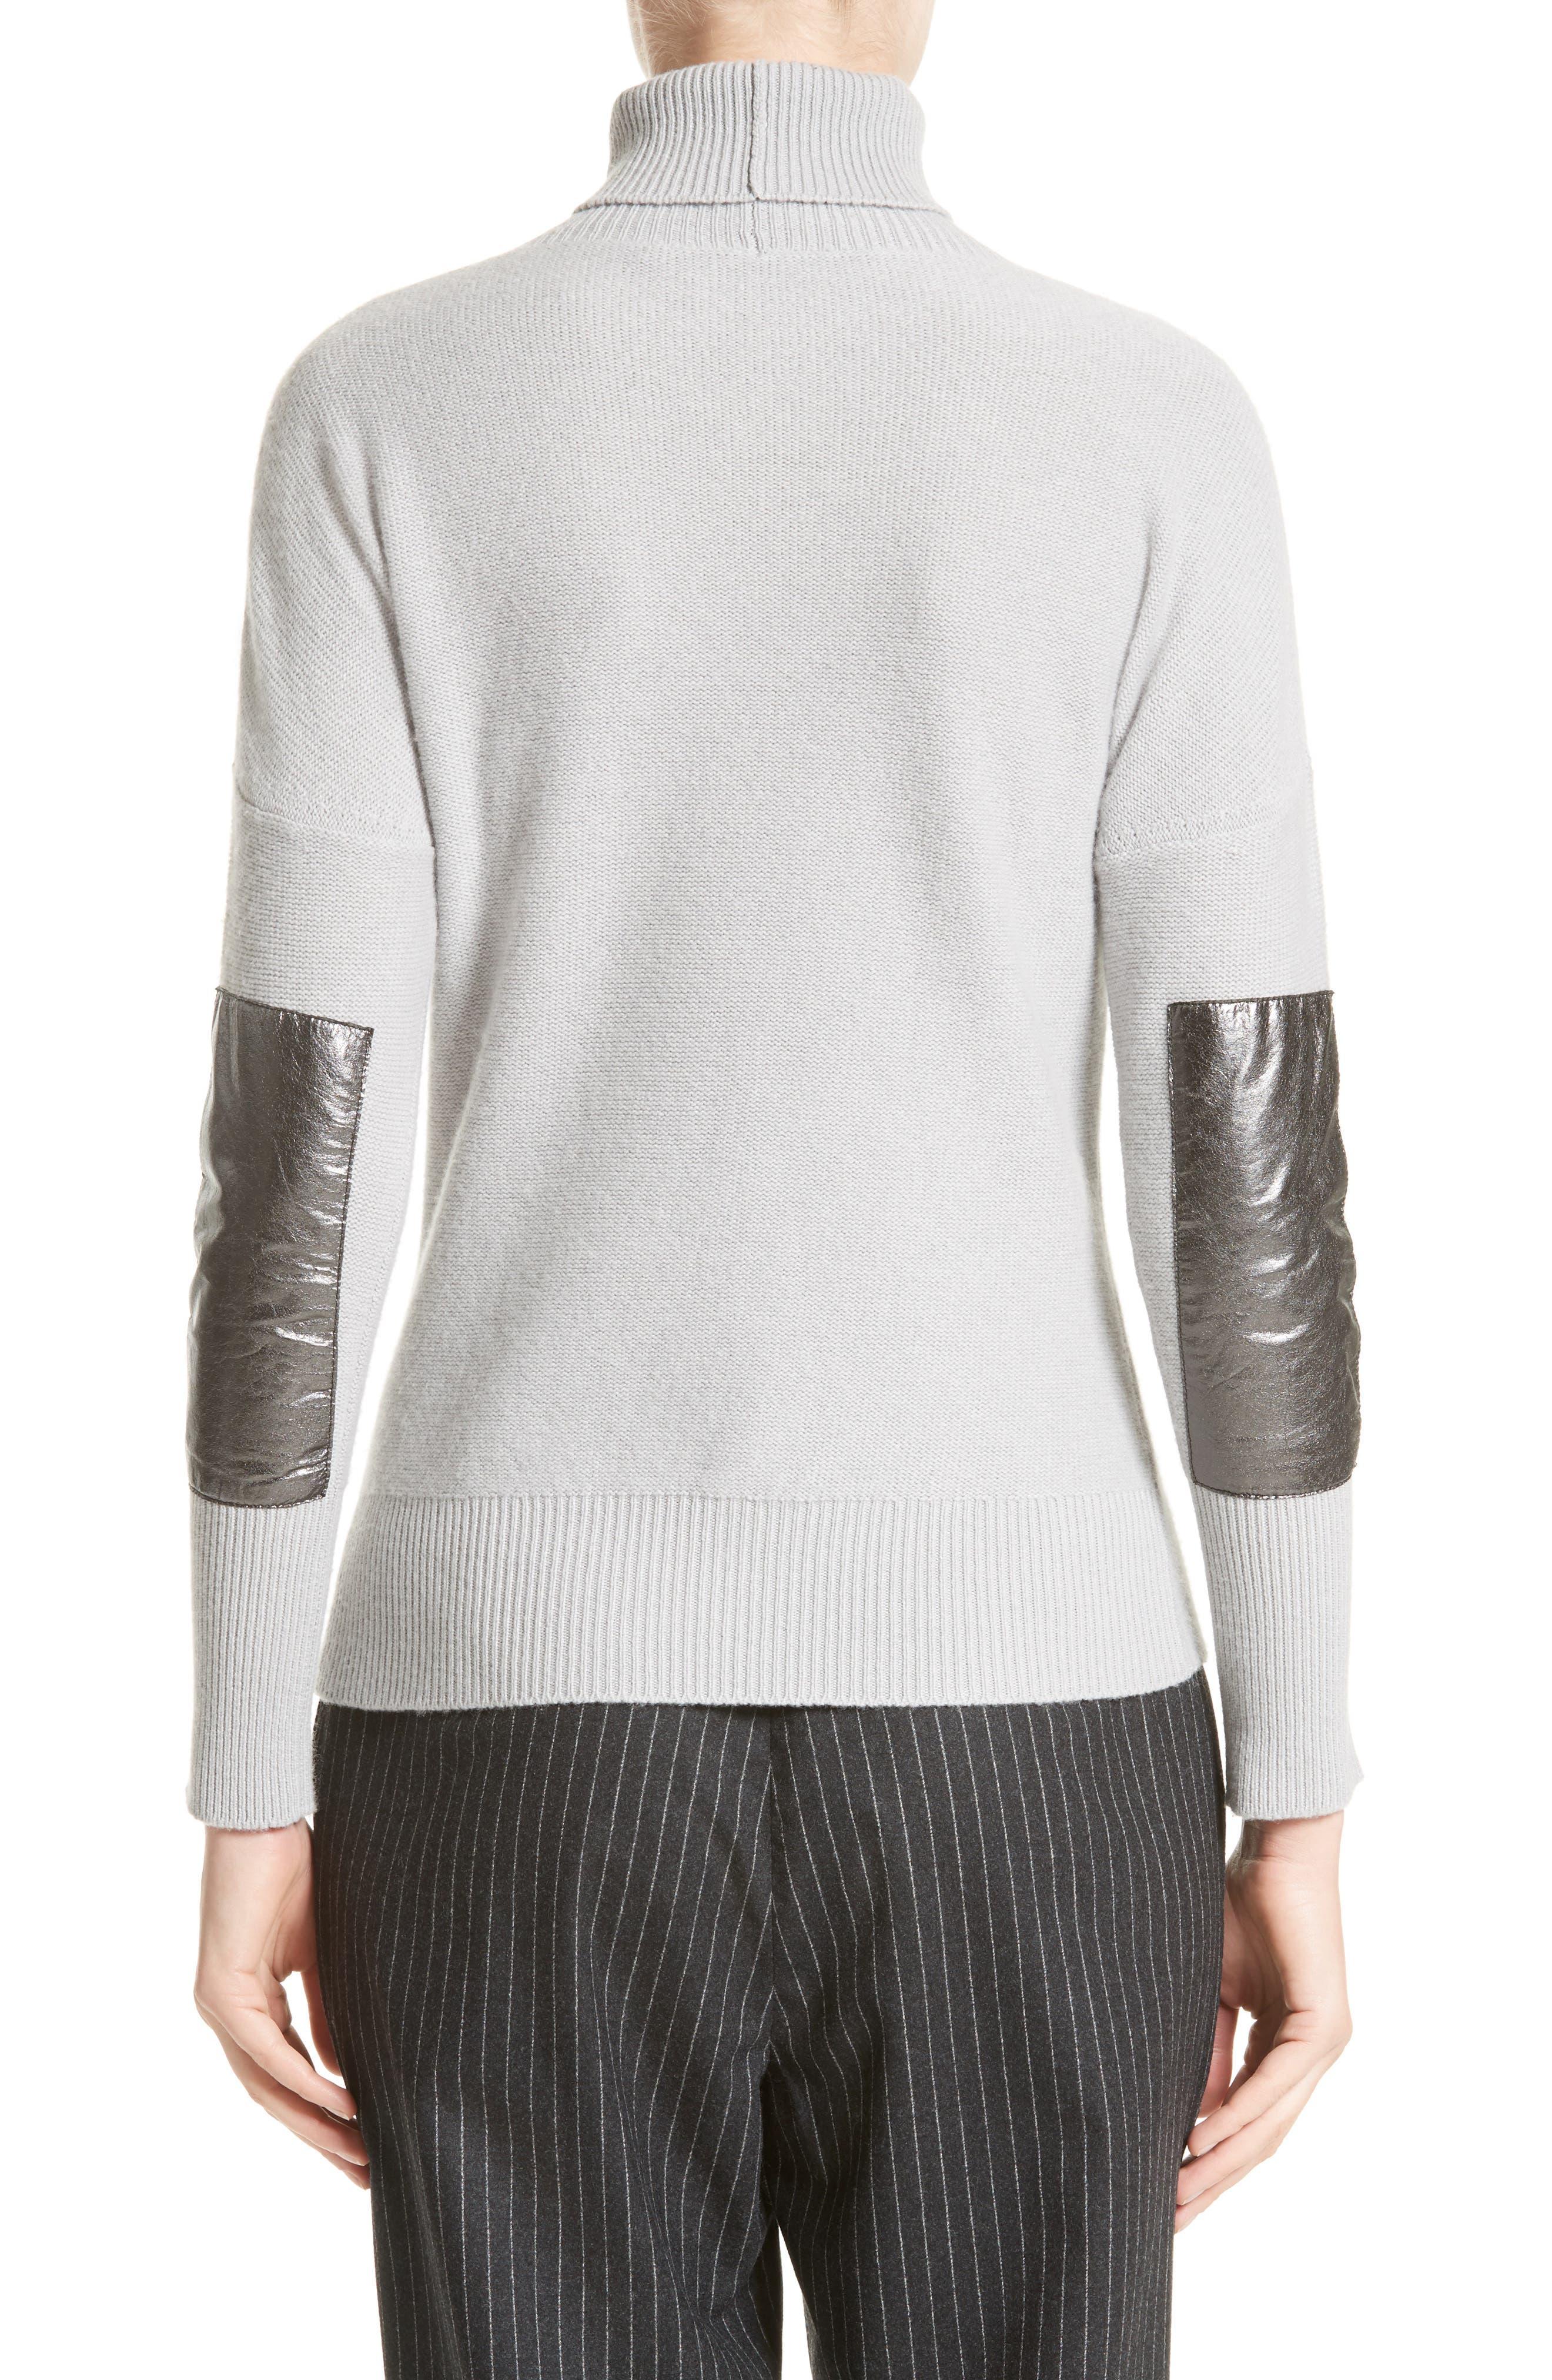 Wool, Silk & Cashmere Knit Turtleneck,                             Alternate thumbnail 2, color,                             050